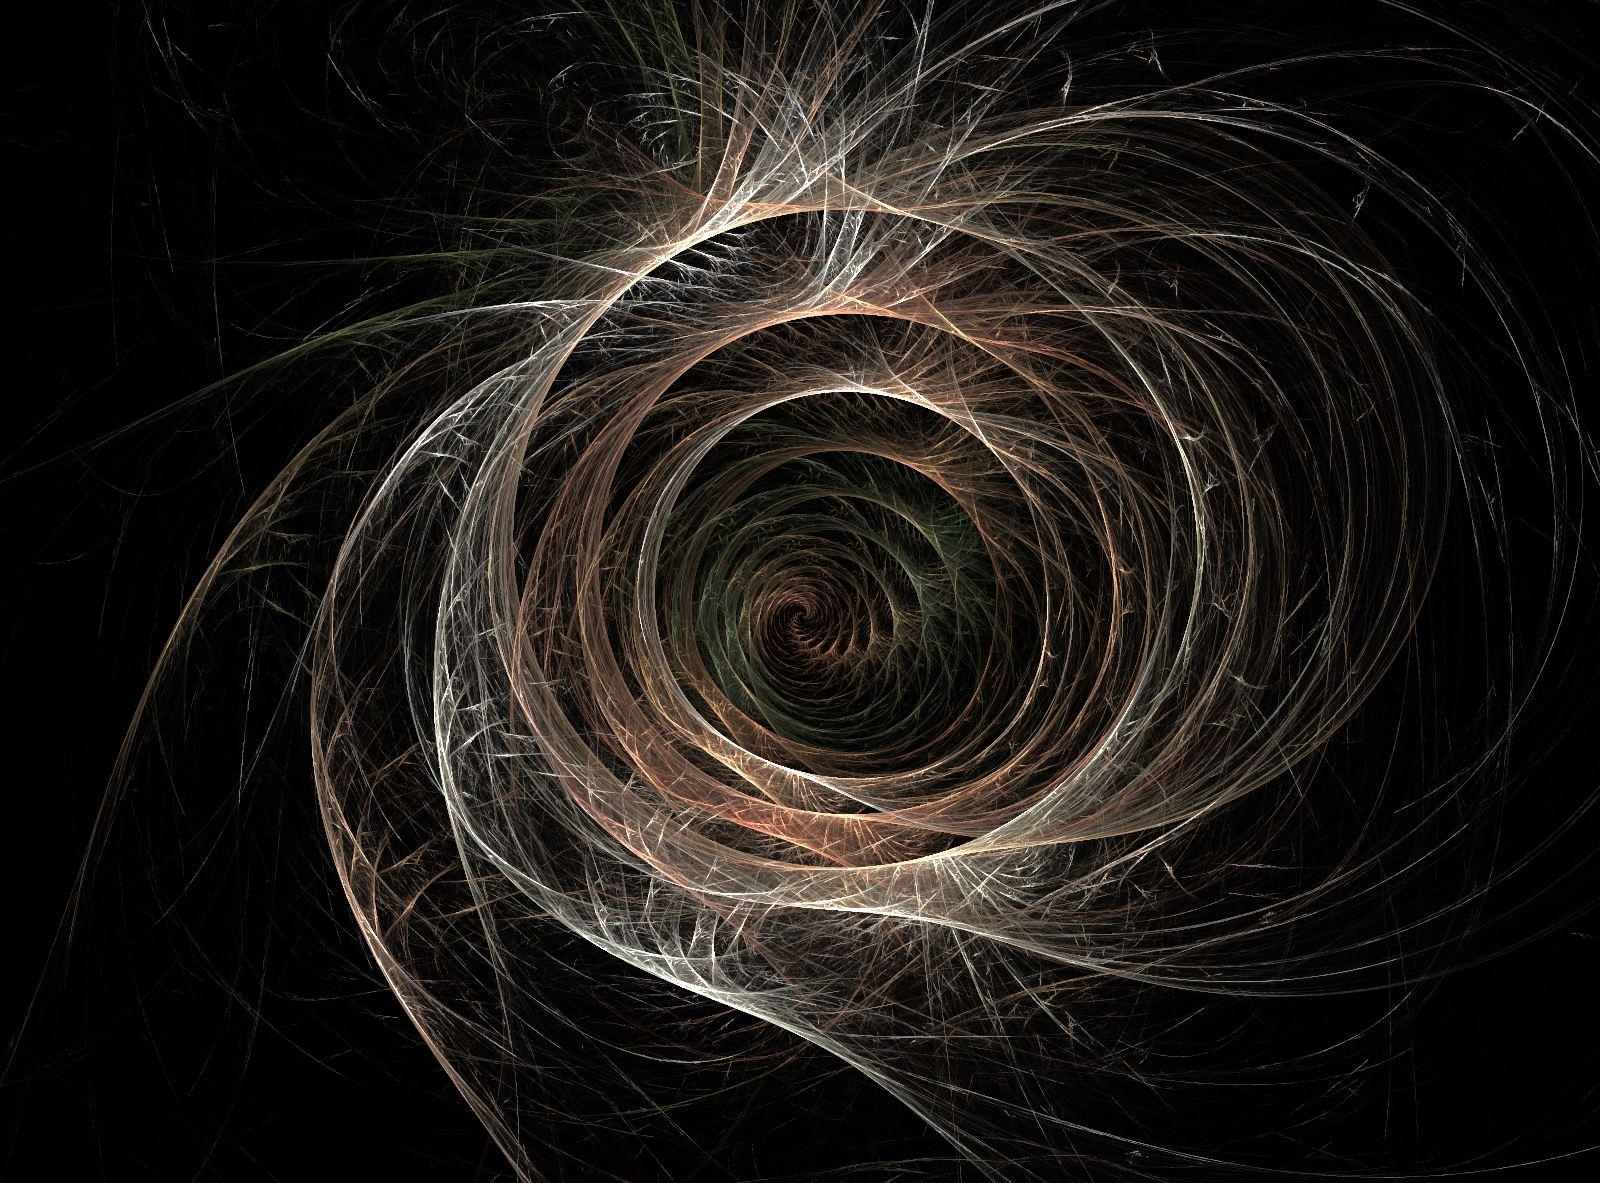 ^6AECBE38EA35473C84F576E9BBAC810E6DECAF9282F22E080F^pimgpsh_fullsize_distr-.jpg, σπείρα σύμπαν,